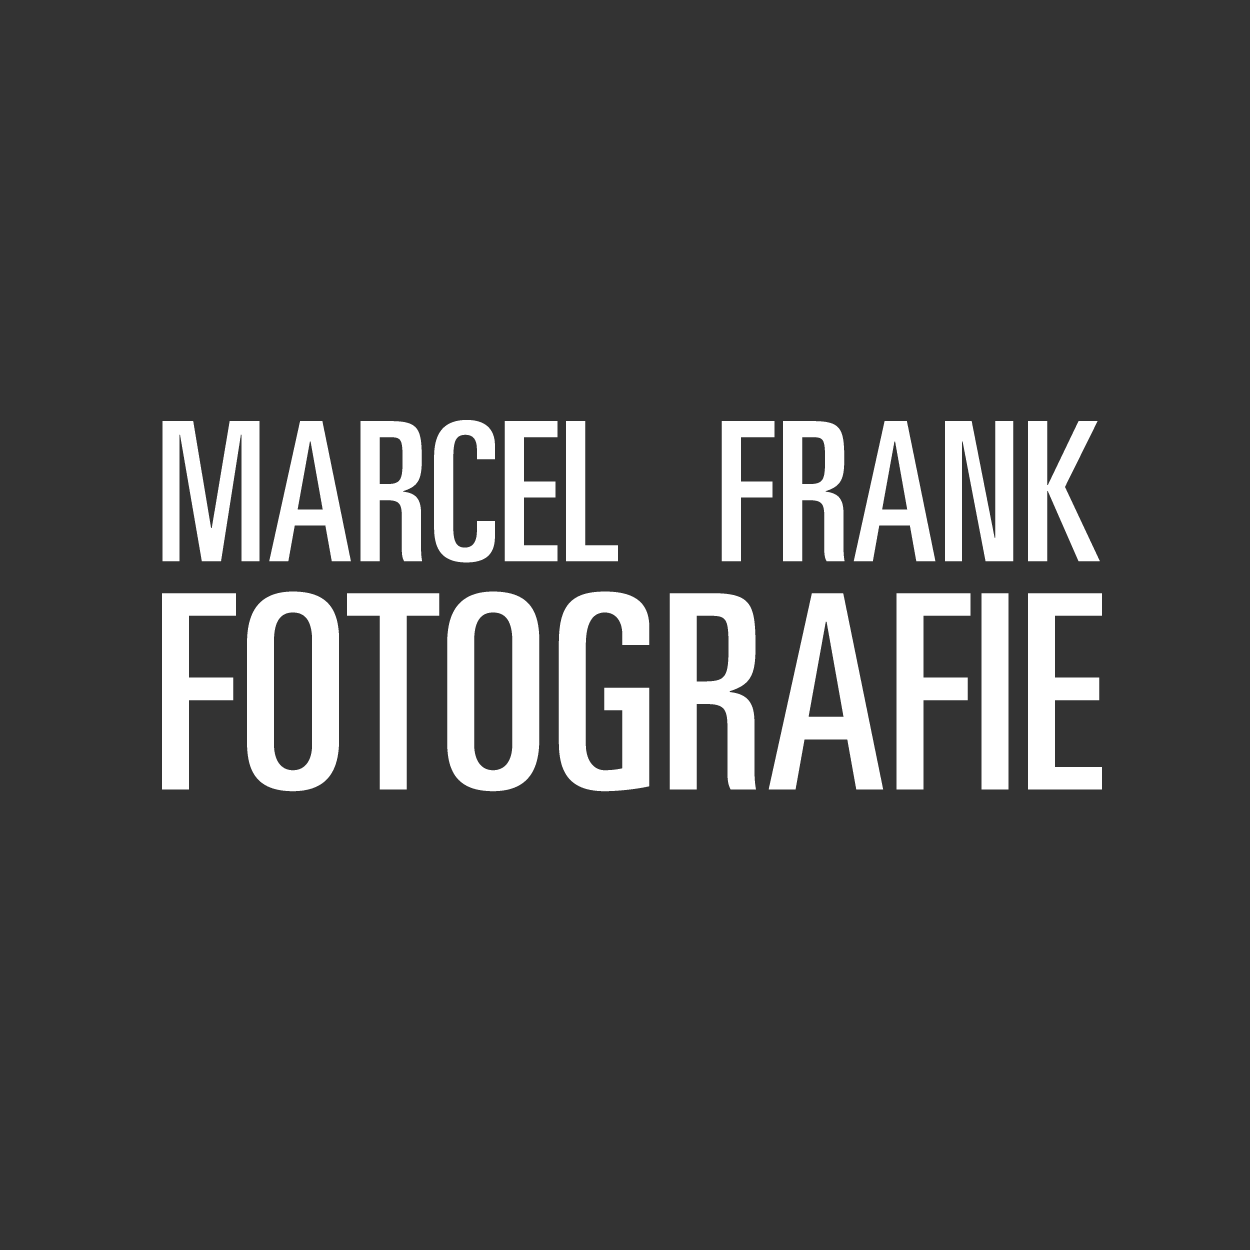 Marcel Frank